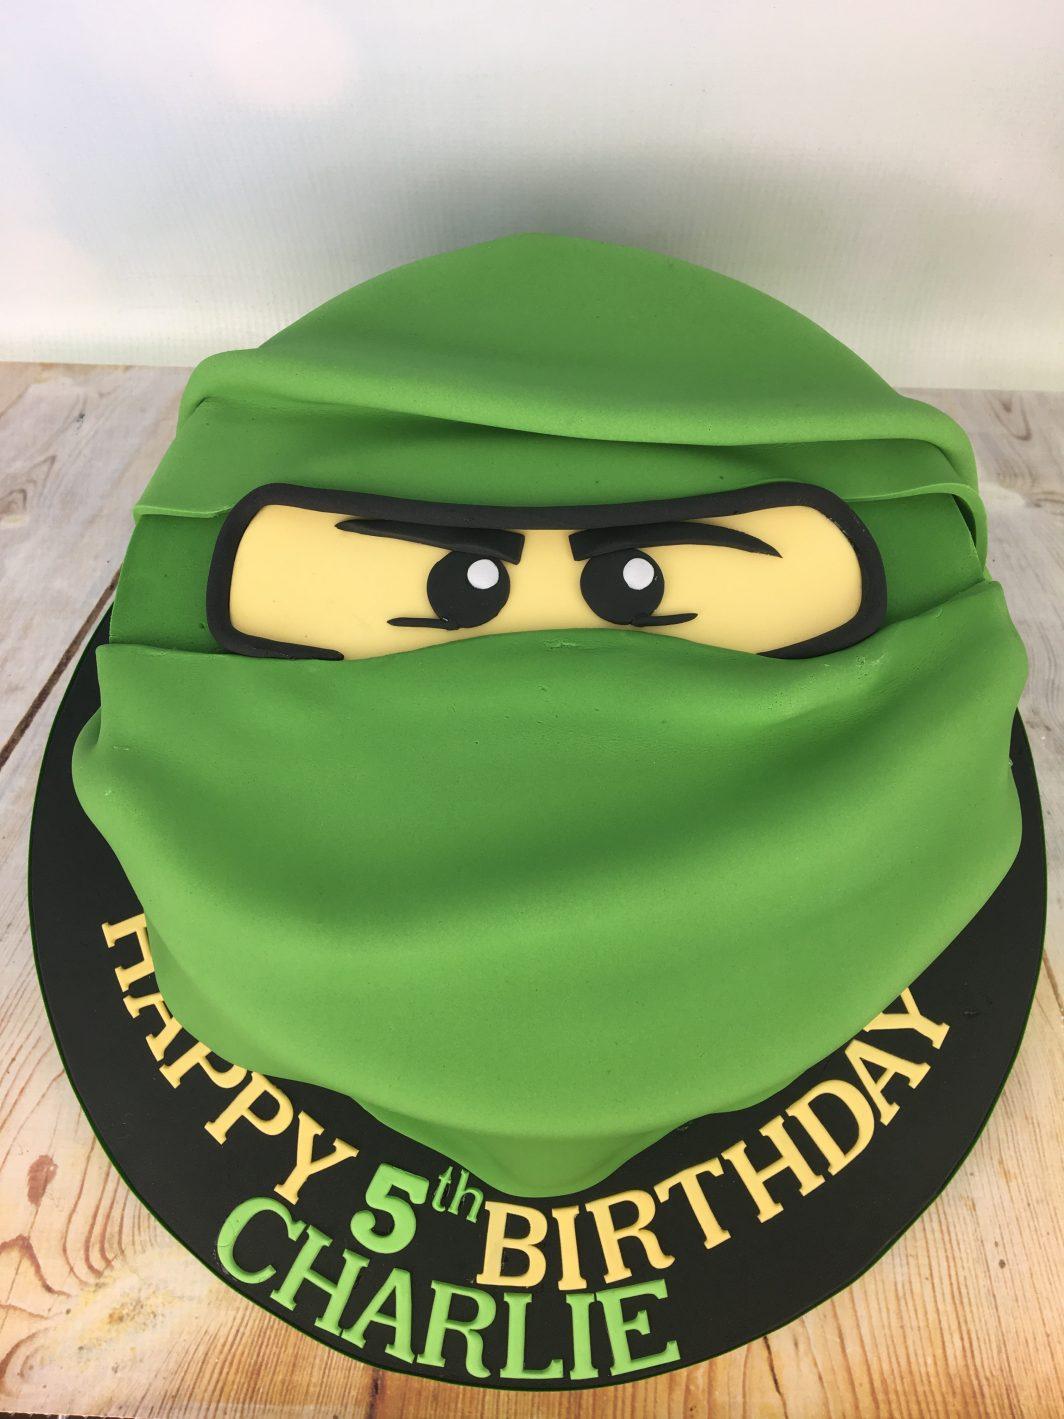 Lego Ninjago 5th birthday cake - Mel's Amazing Cakes